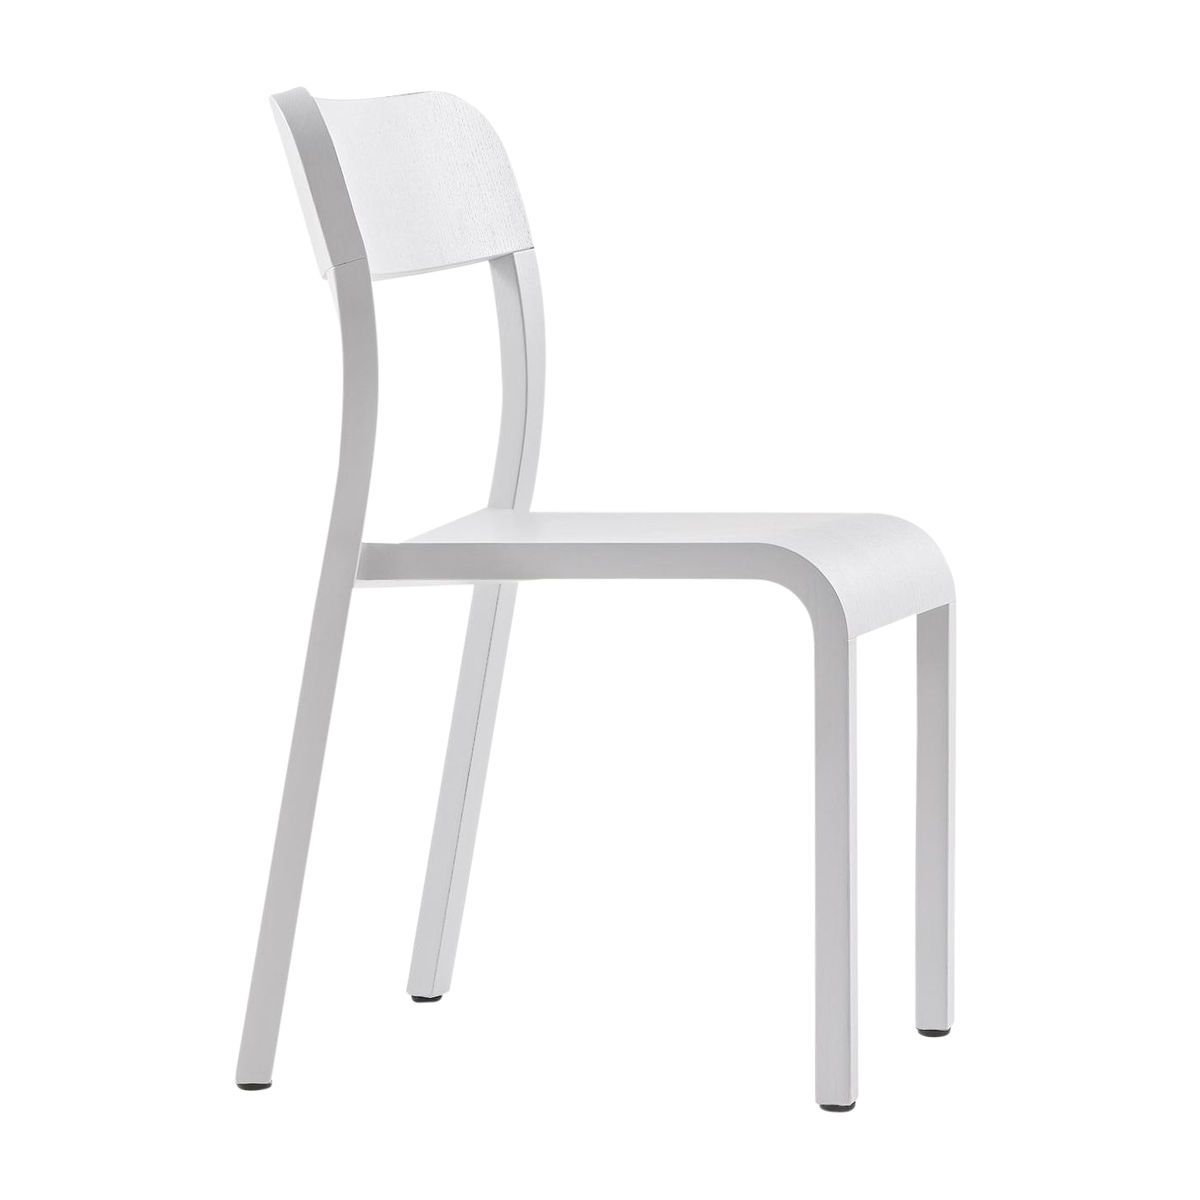 blocco chair plank. Black Bedroom Furniture Sets. Home Design Ideas